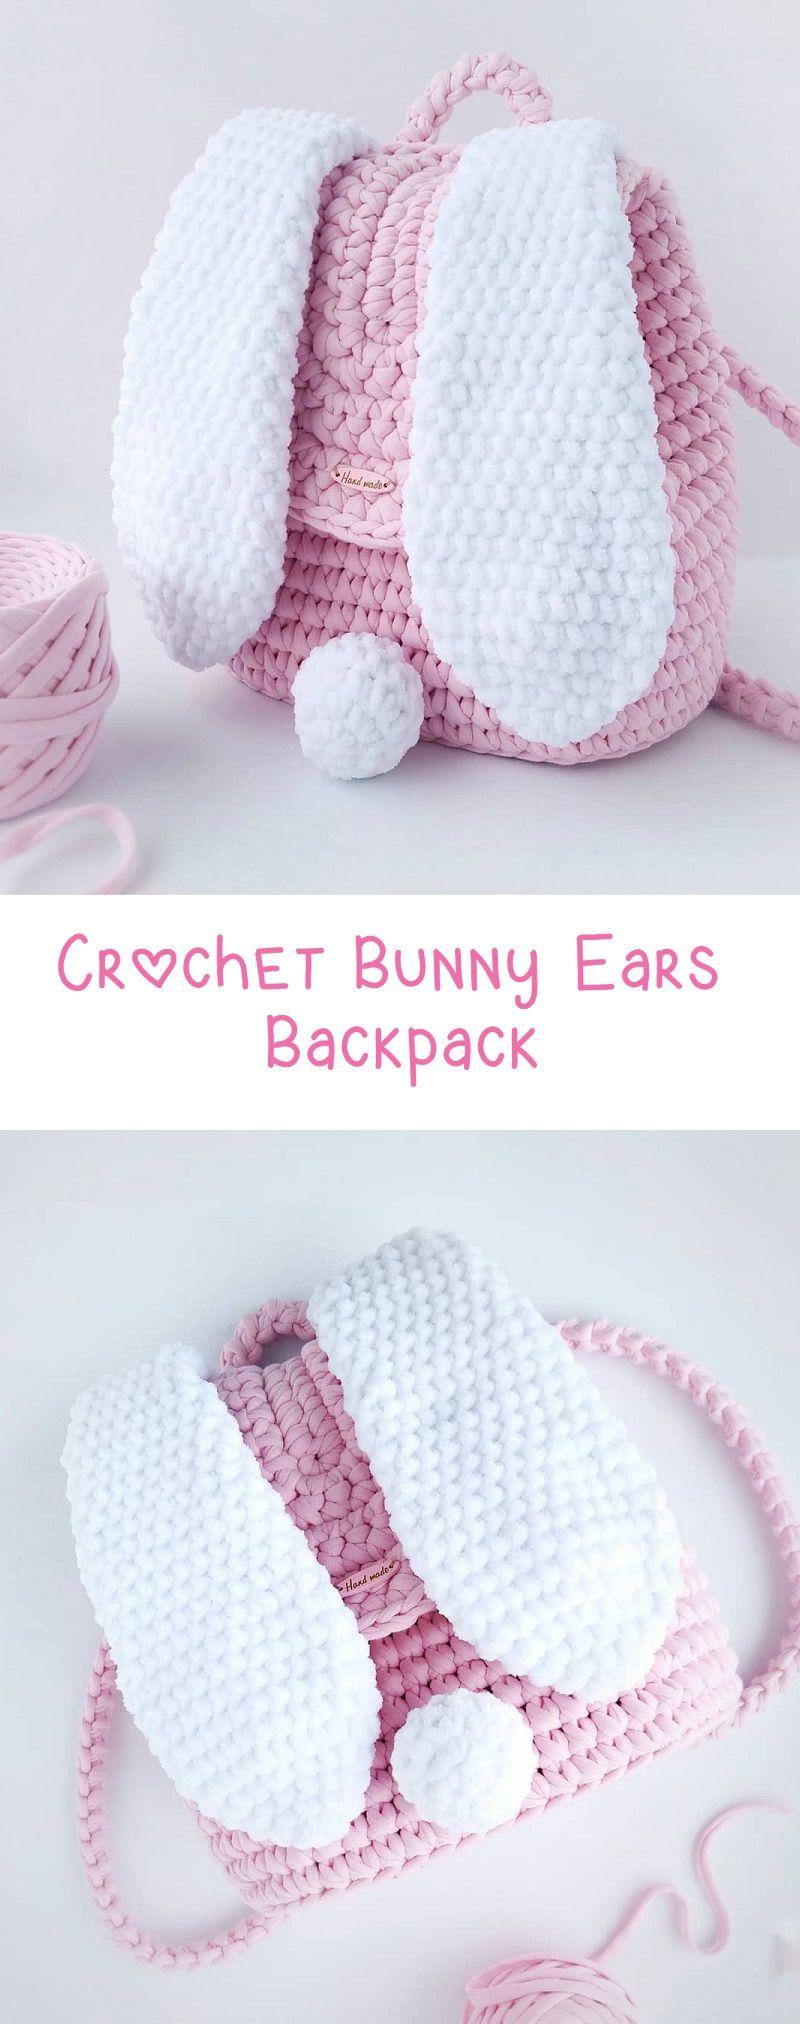 Crochet Backpack – Bunny Ears – Design Peak